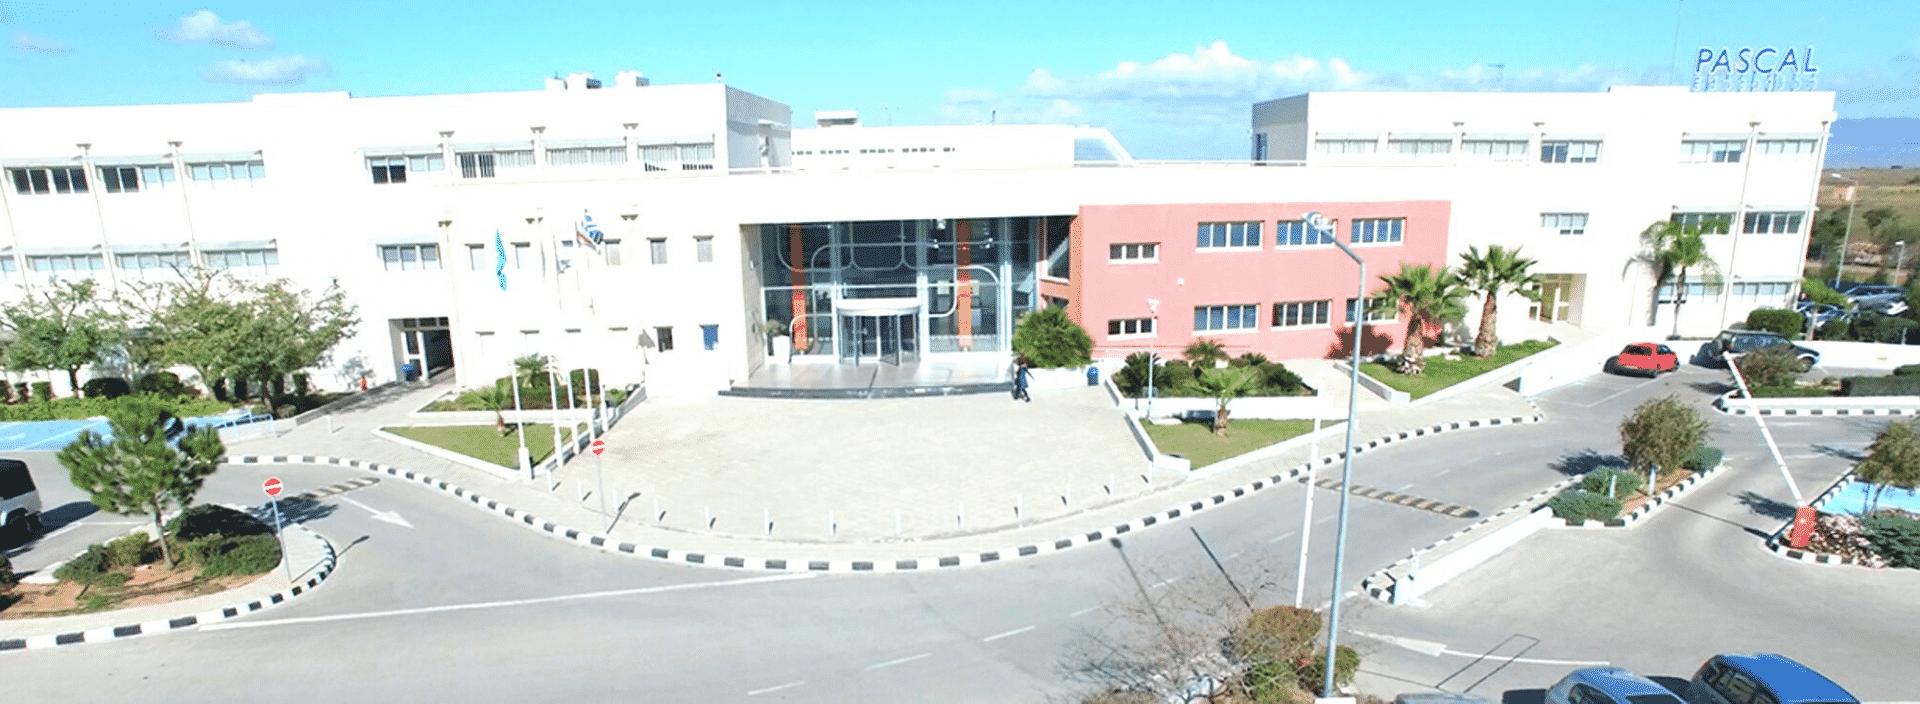 private schools in larnaca